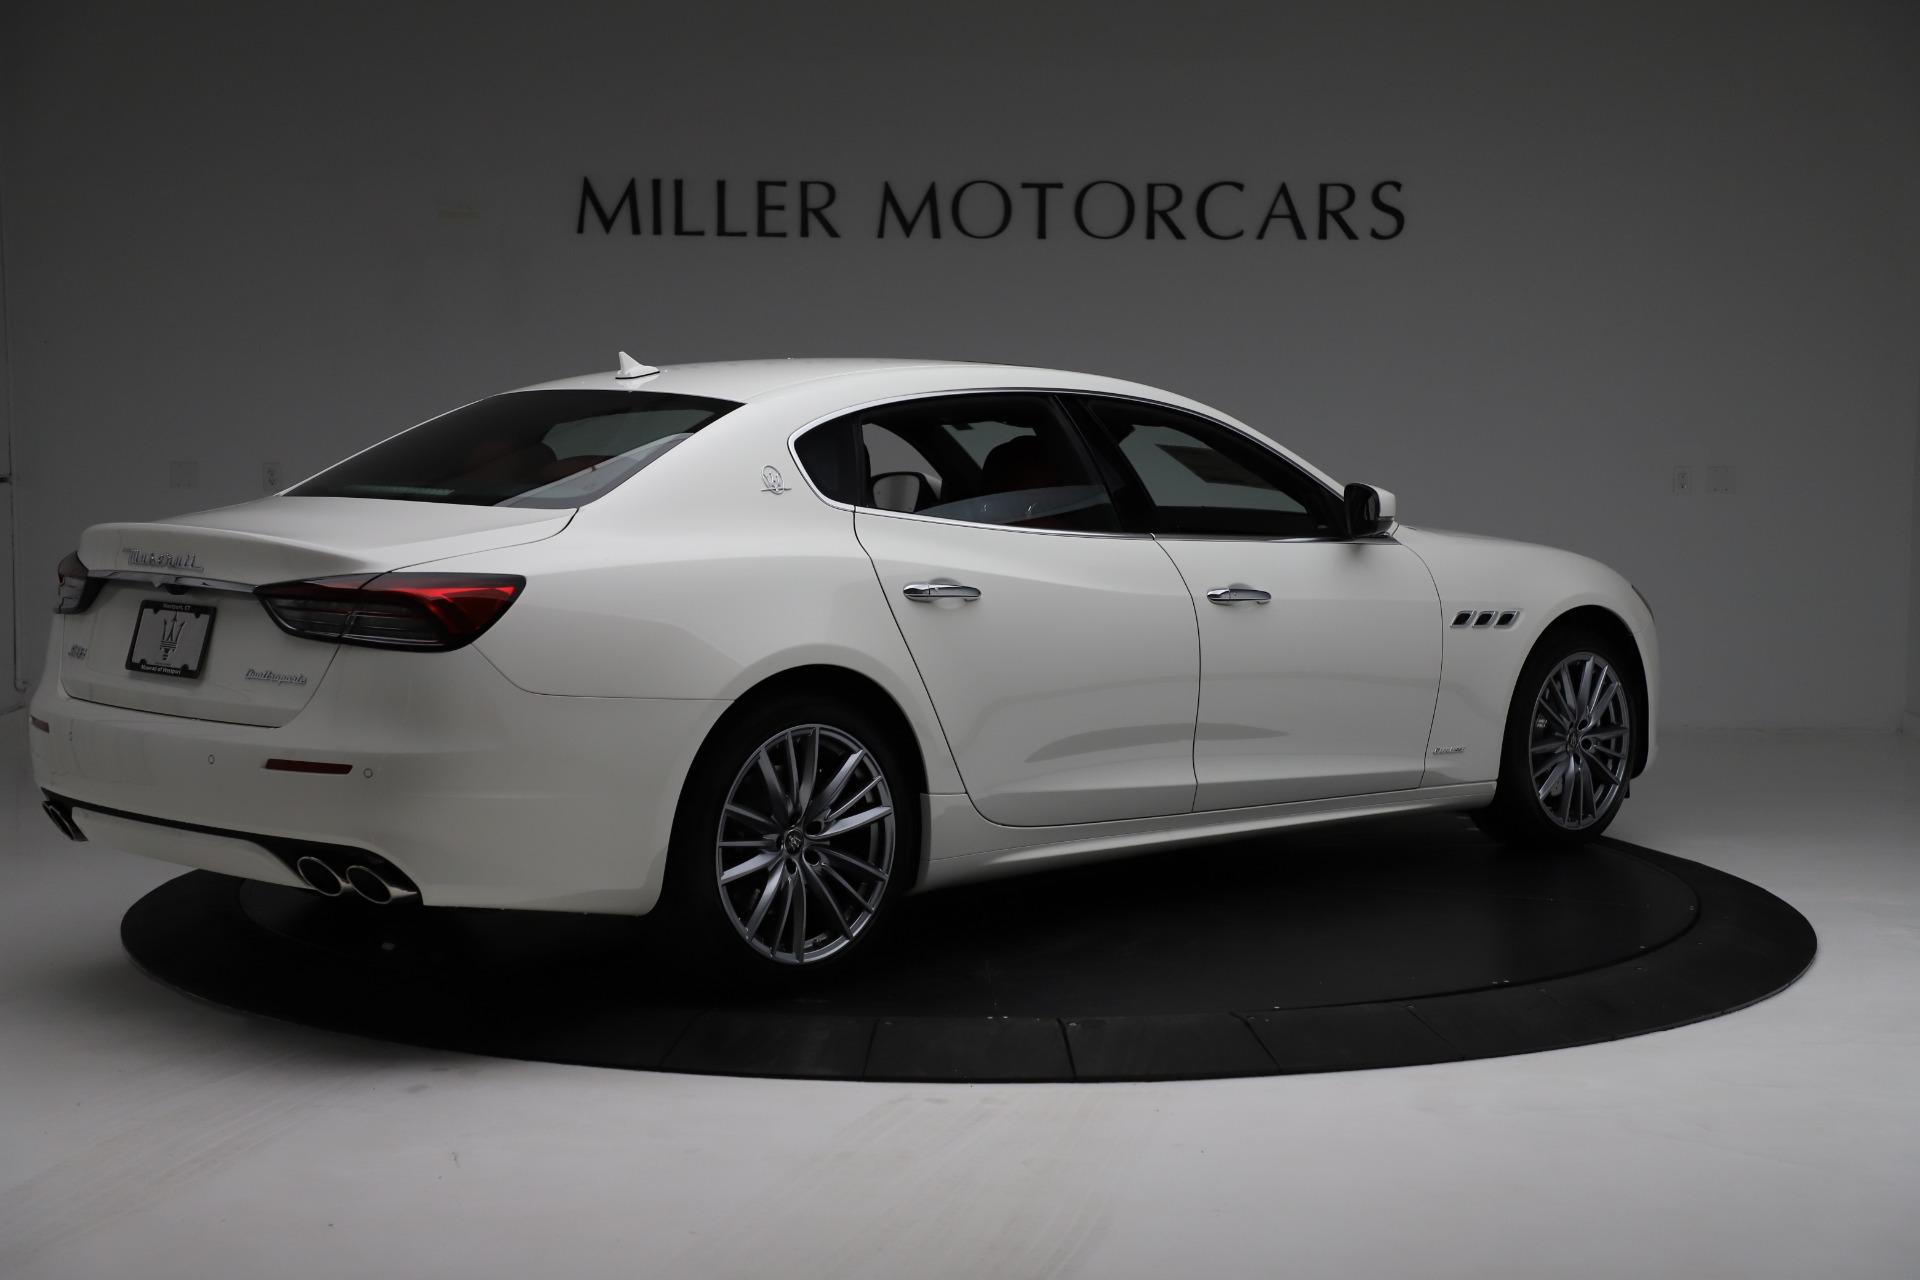 New-2021-Maserati-Quattroporte-S-Q4-GranLusso